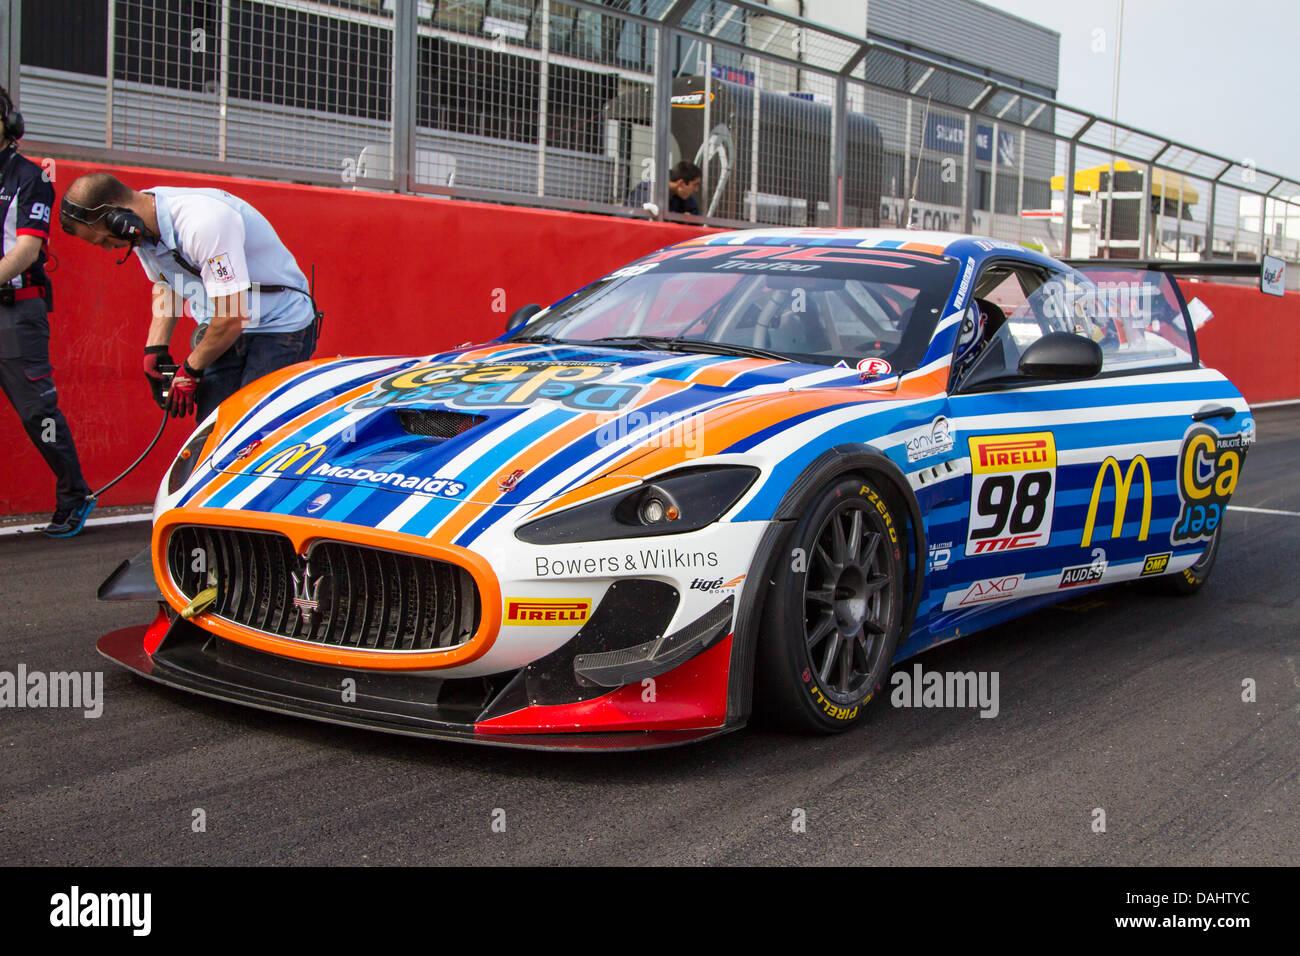 maserati trofeo mc world series photo's of cars on grid getting